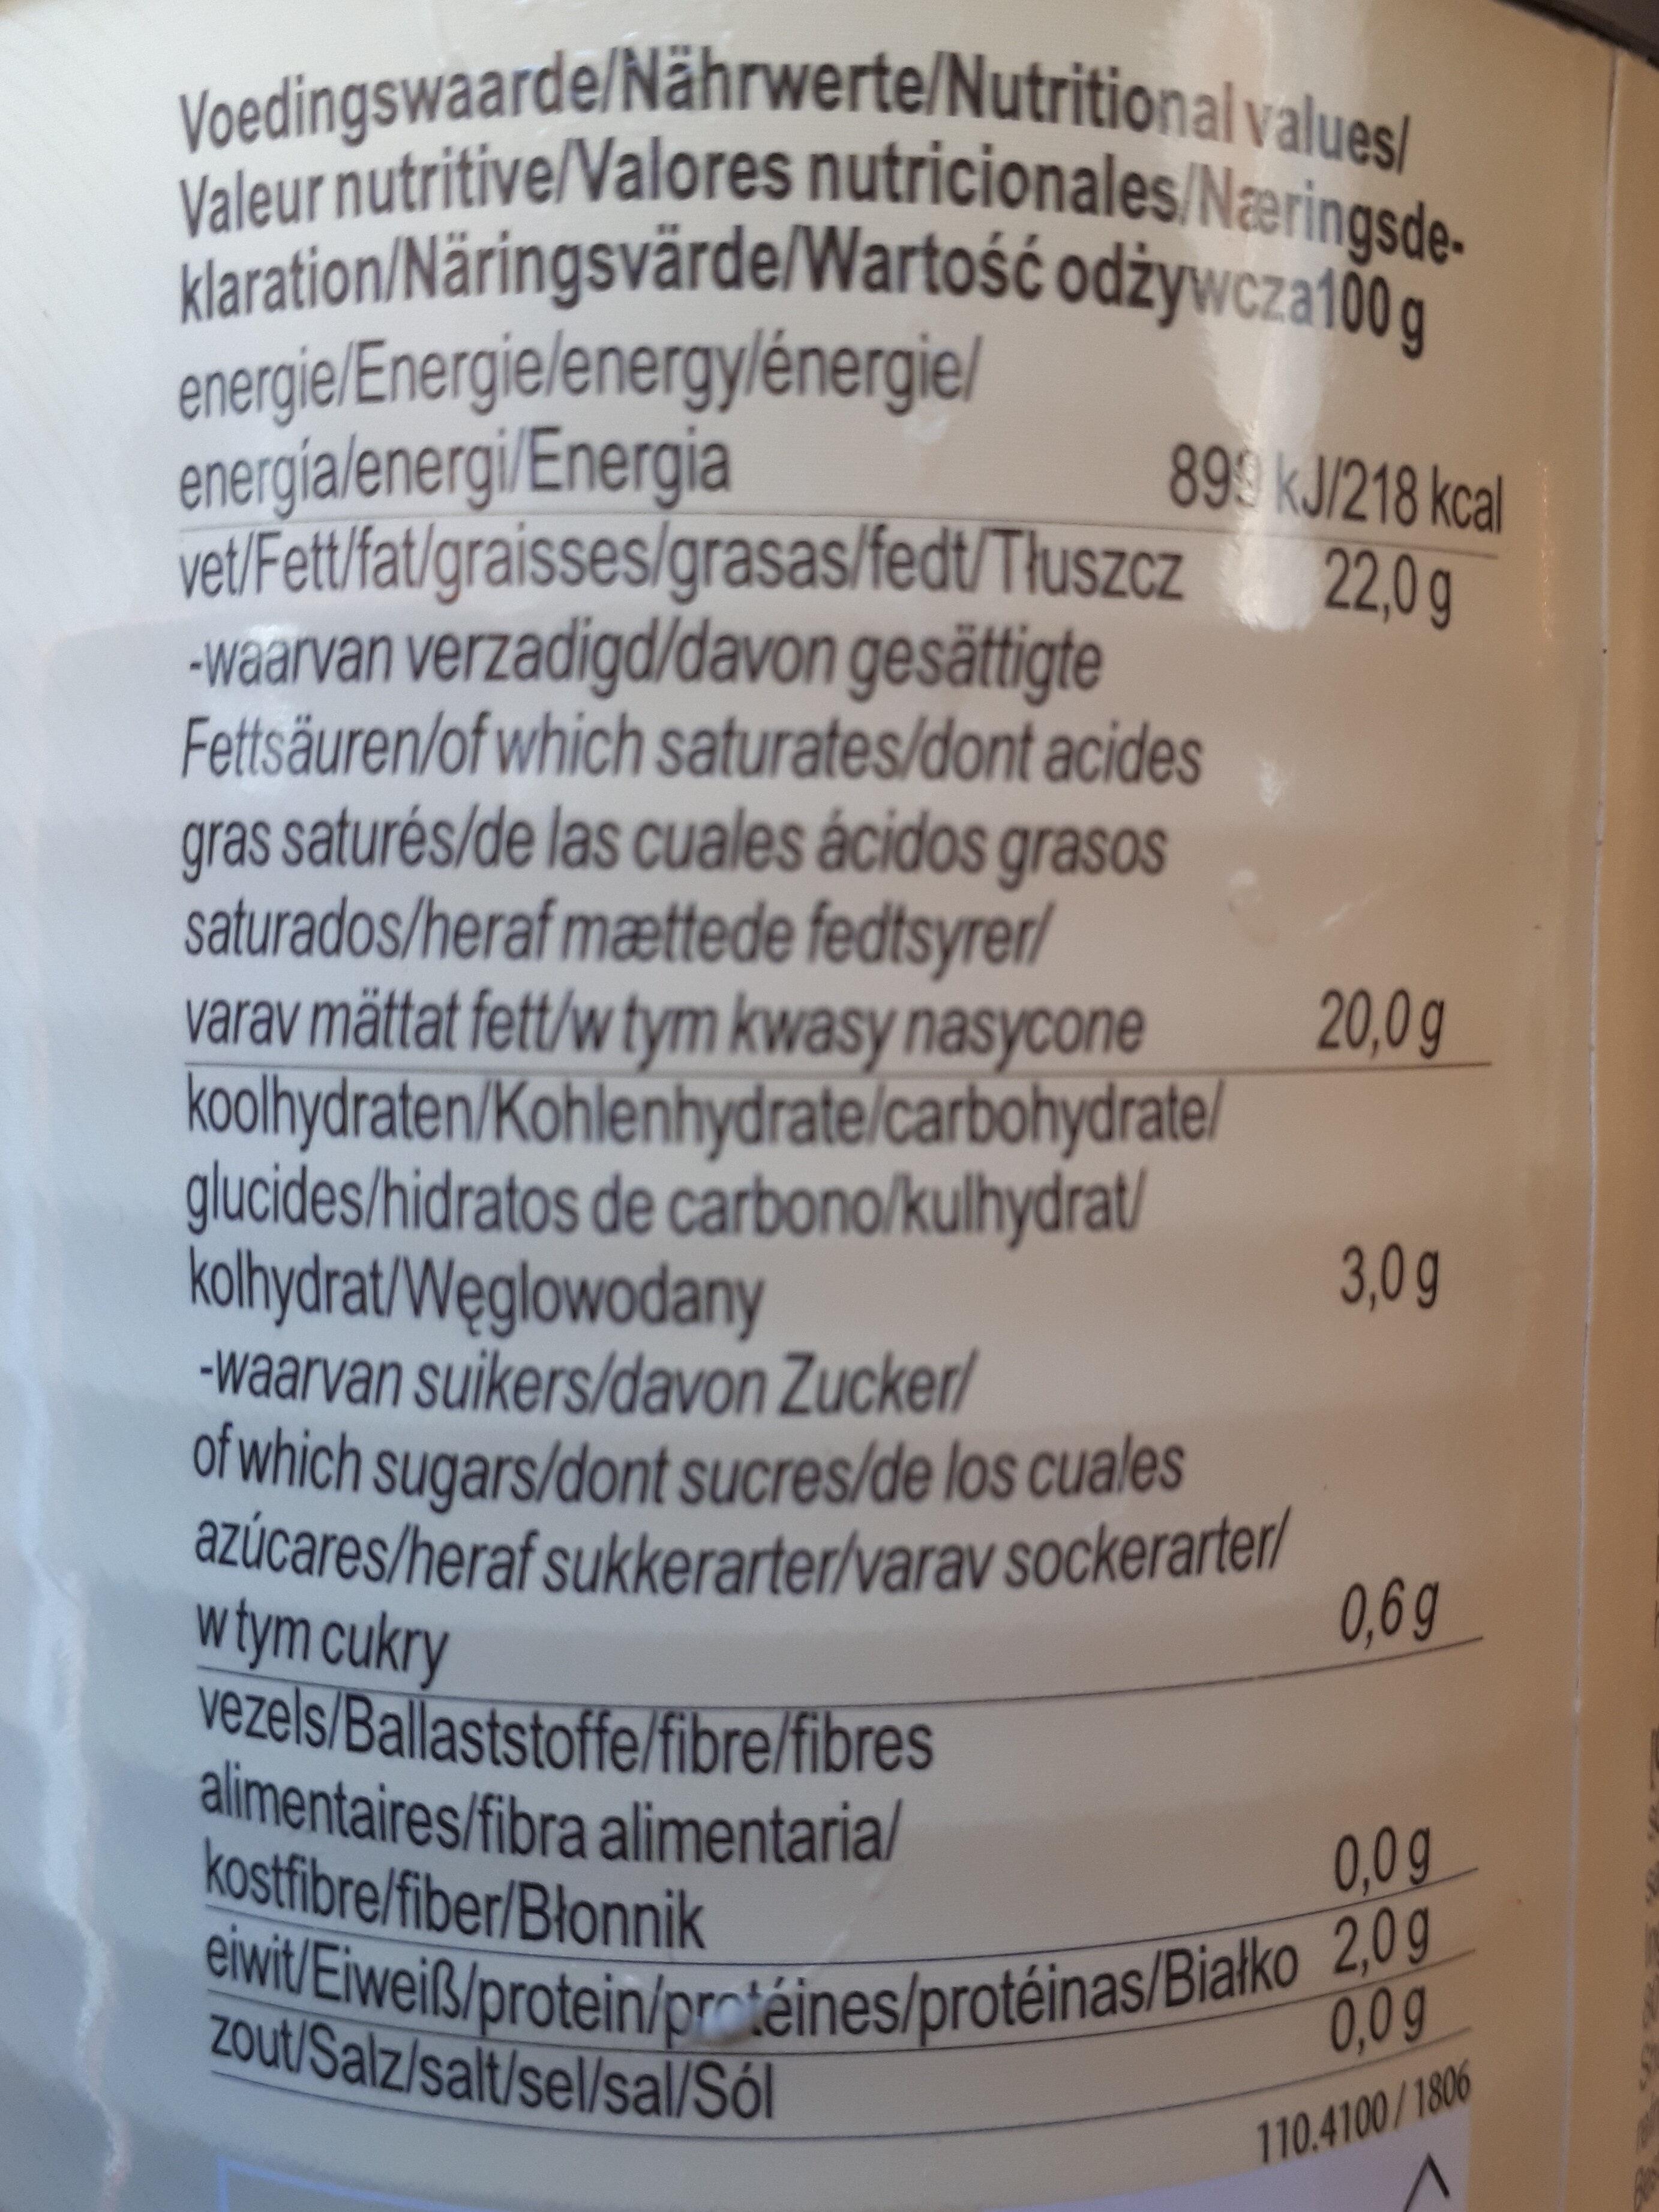 Kokosnuss milch - Informations nutritionnelles - fr